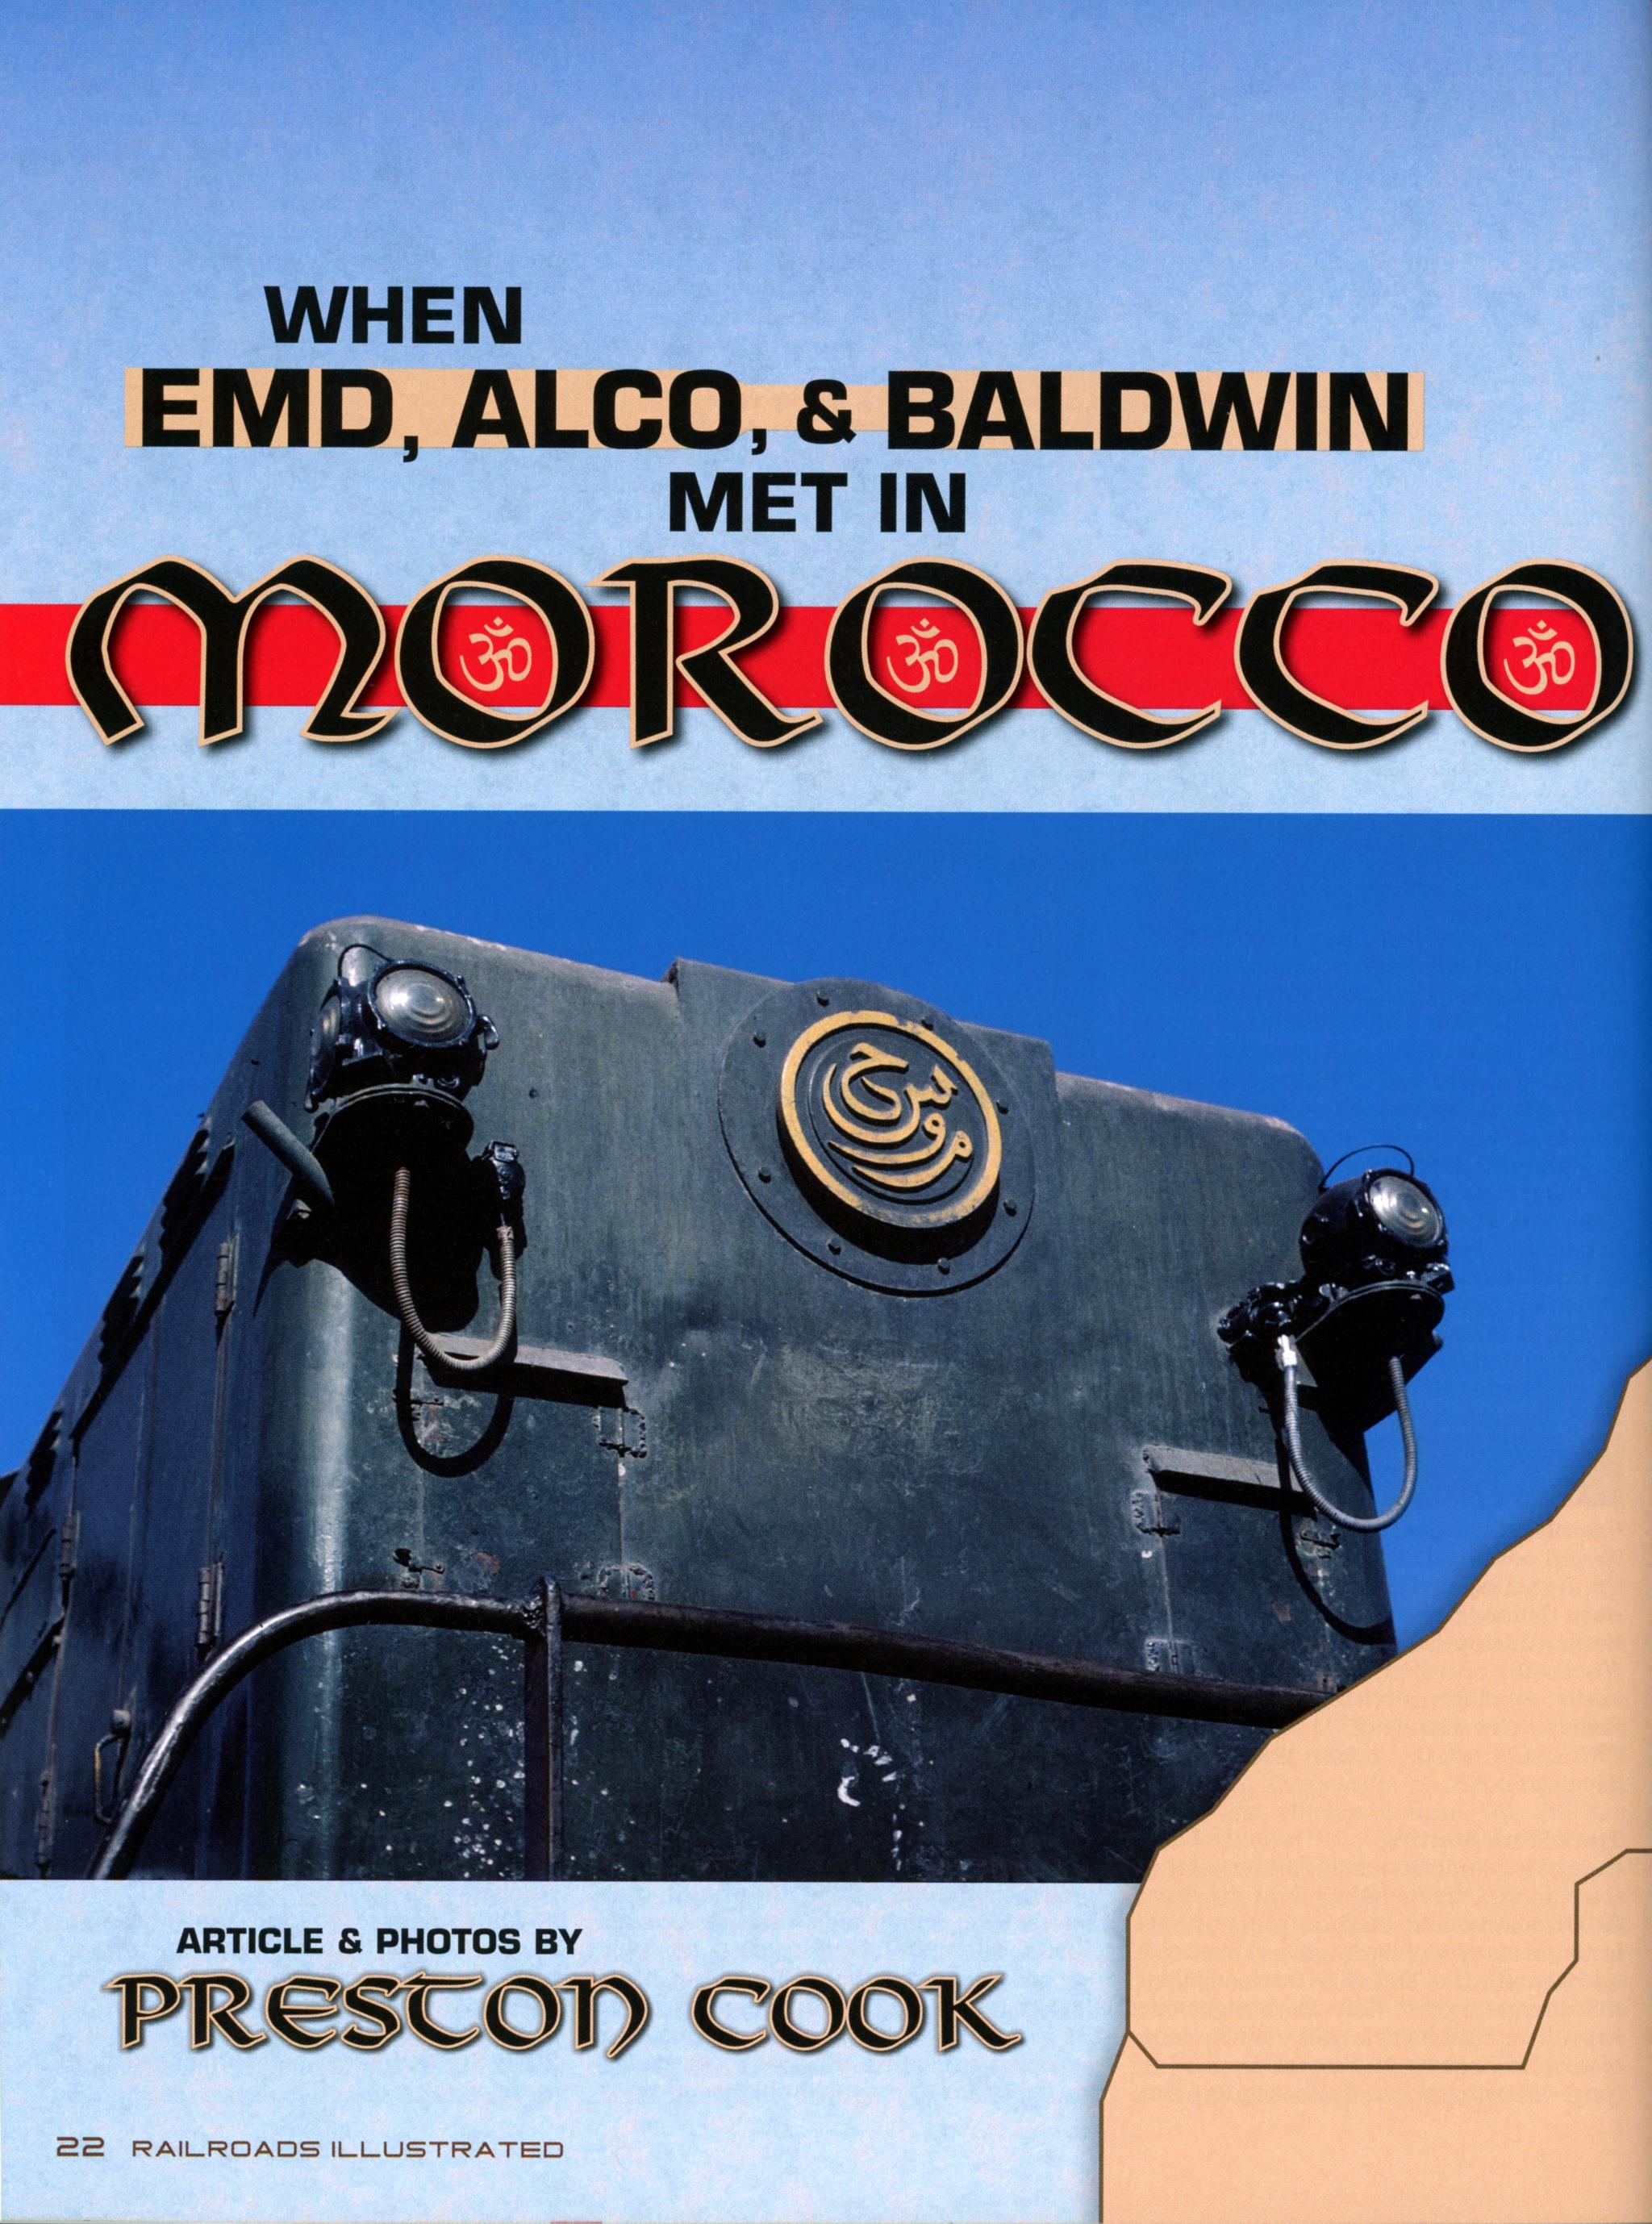 Chemins de Fer au Maroc - ONCF  - Page 5 49775908027_b5b5ef1a7c_o_d